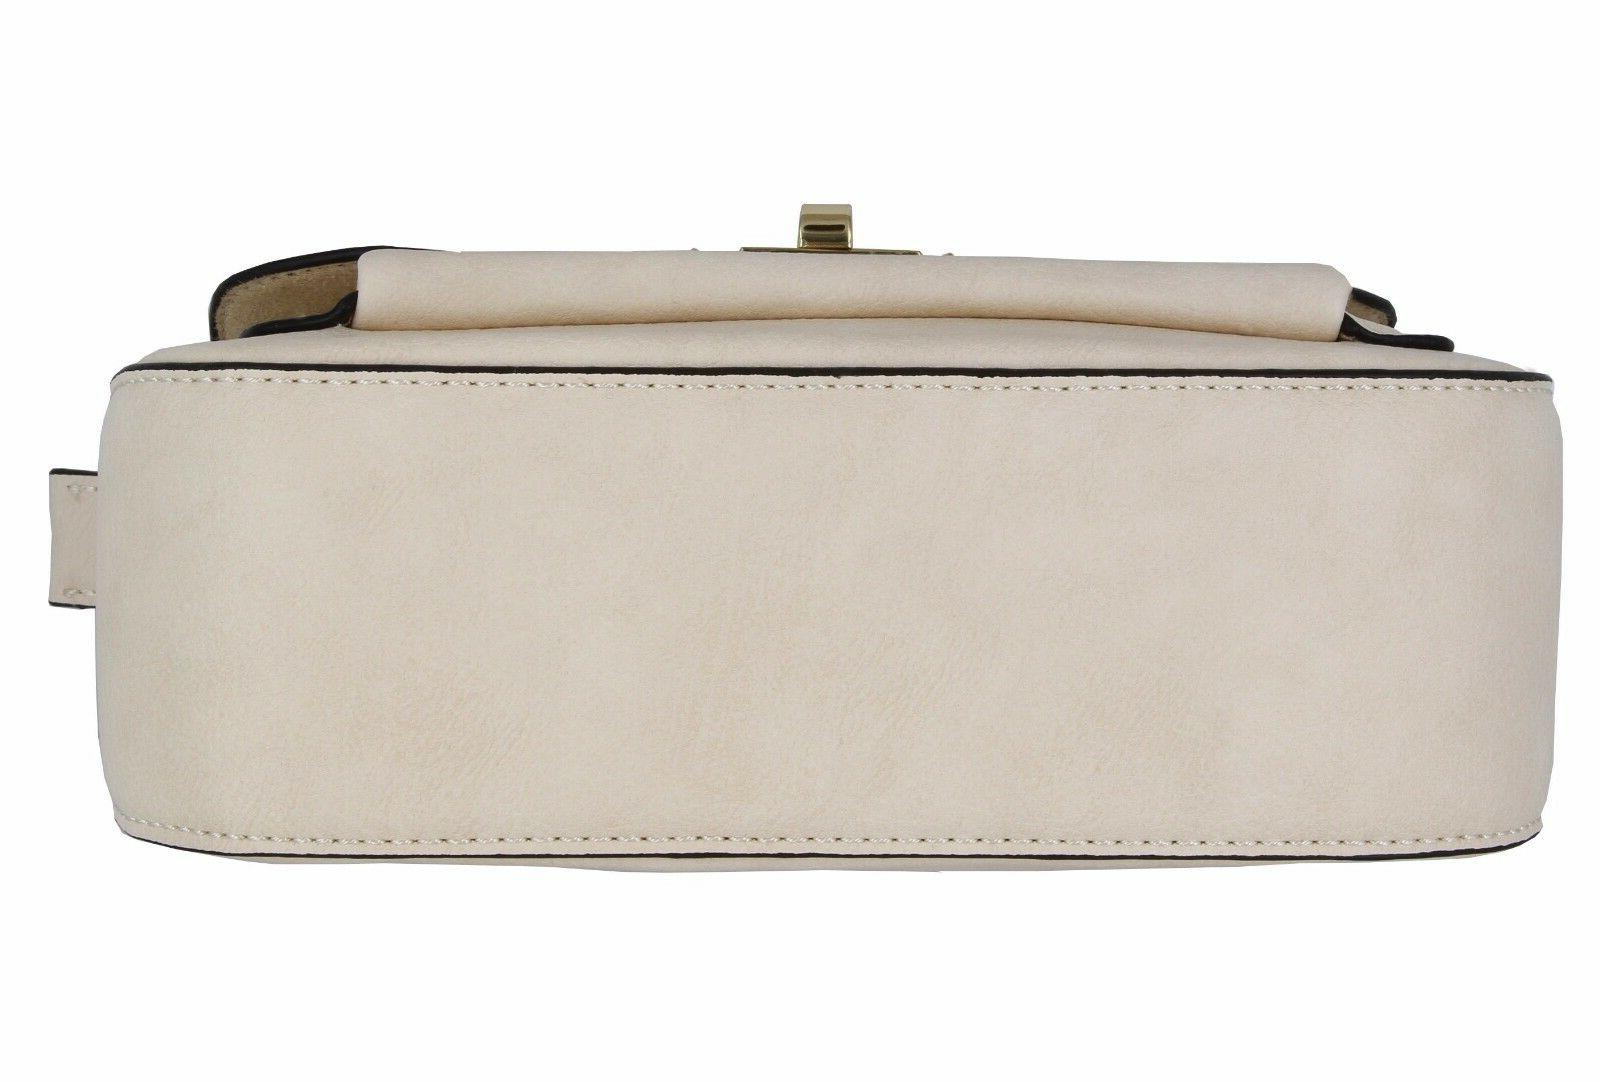 Alyssa Flap Bag Handbag Purse